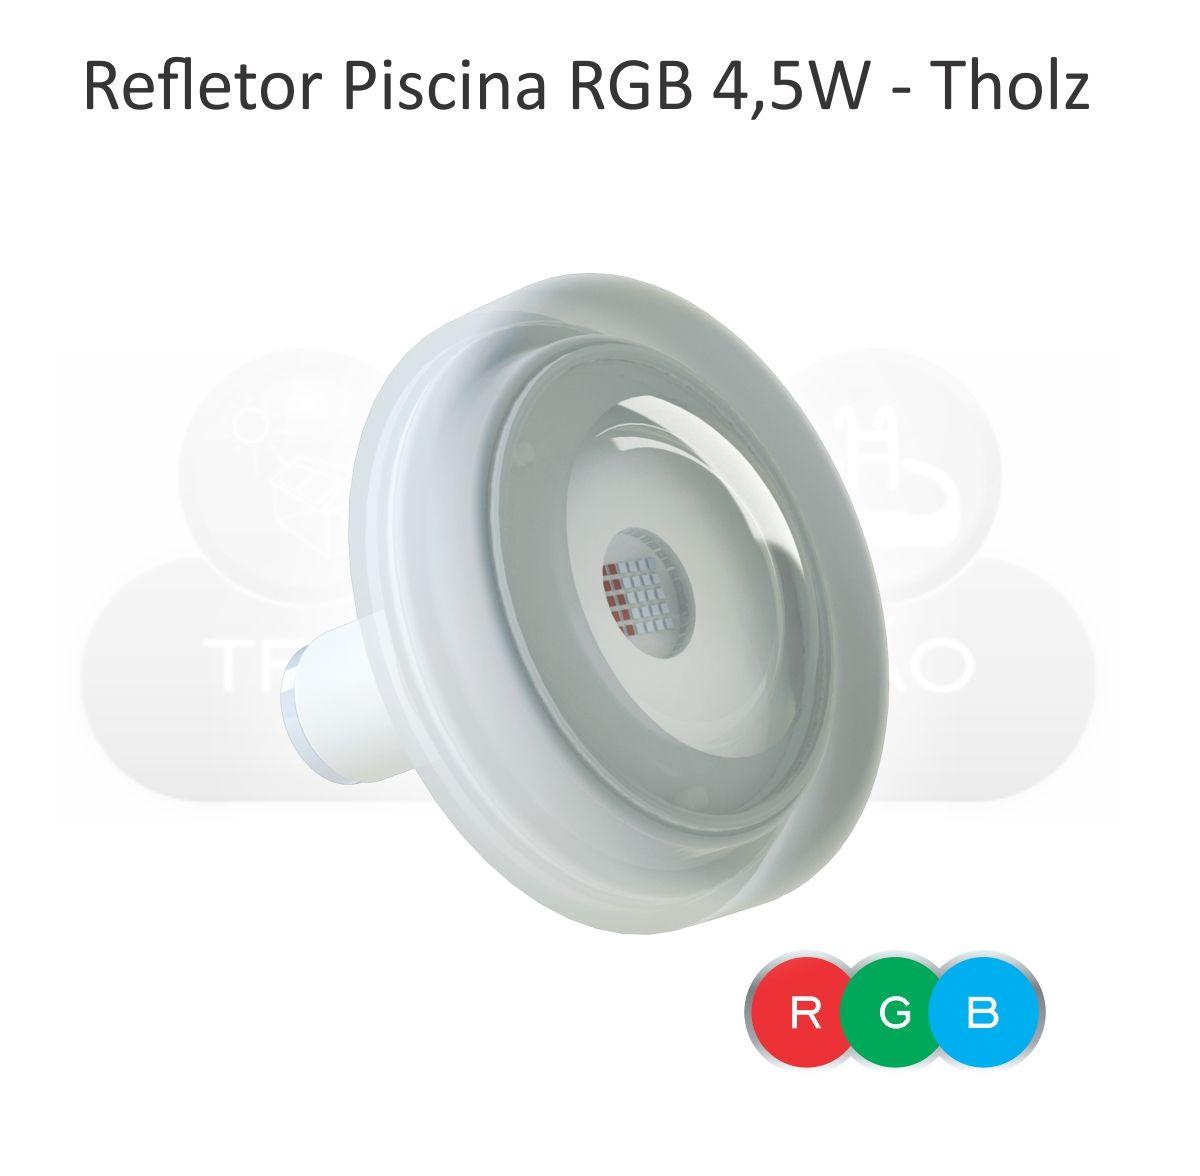 Kit Iluminação Piscina - Contr touch 50w + 6 Leds 4,5w Rgb Tholz cabo 2m